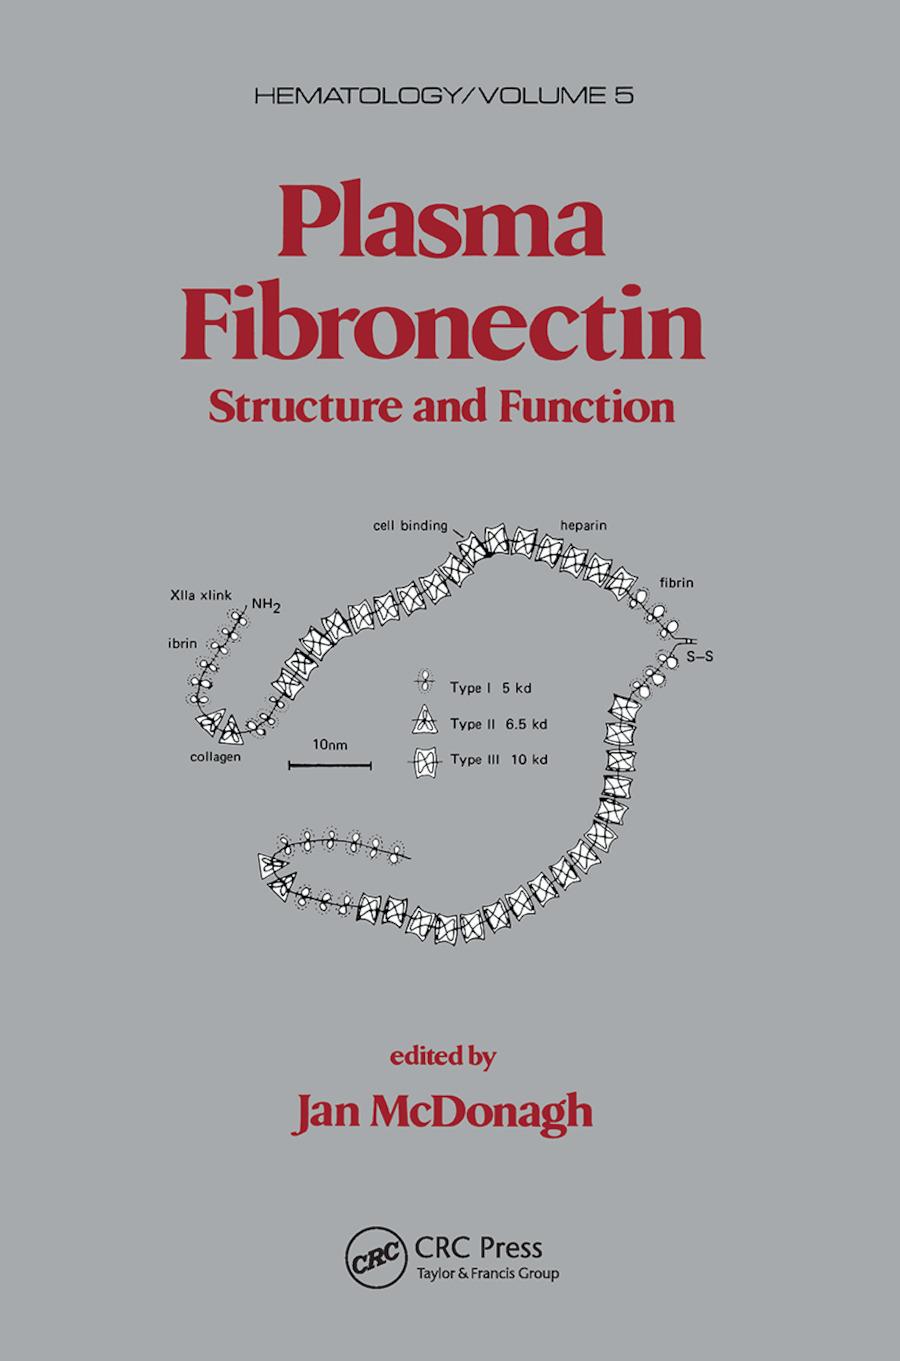 Plasma Fibronectin